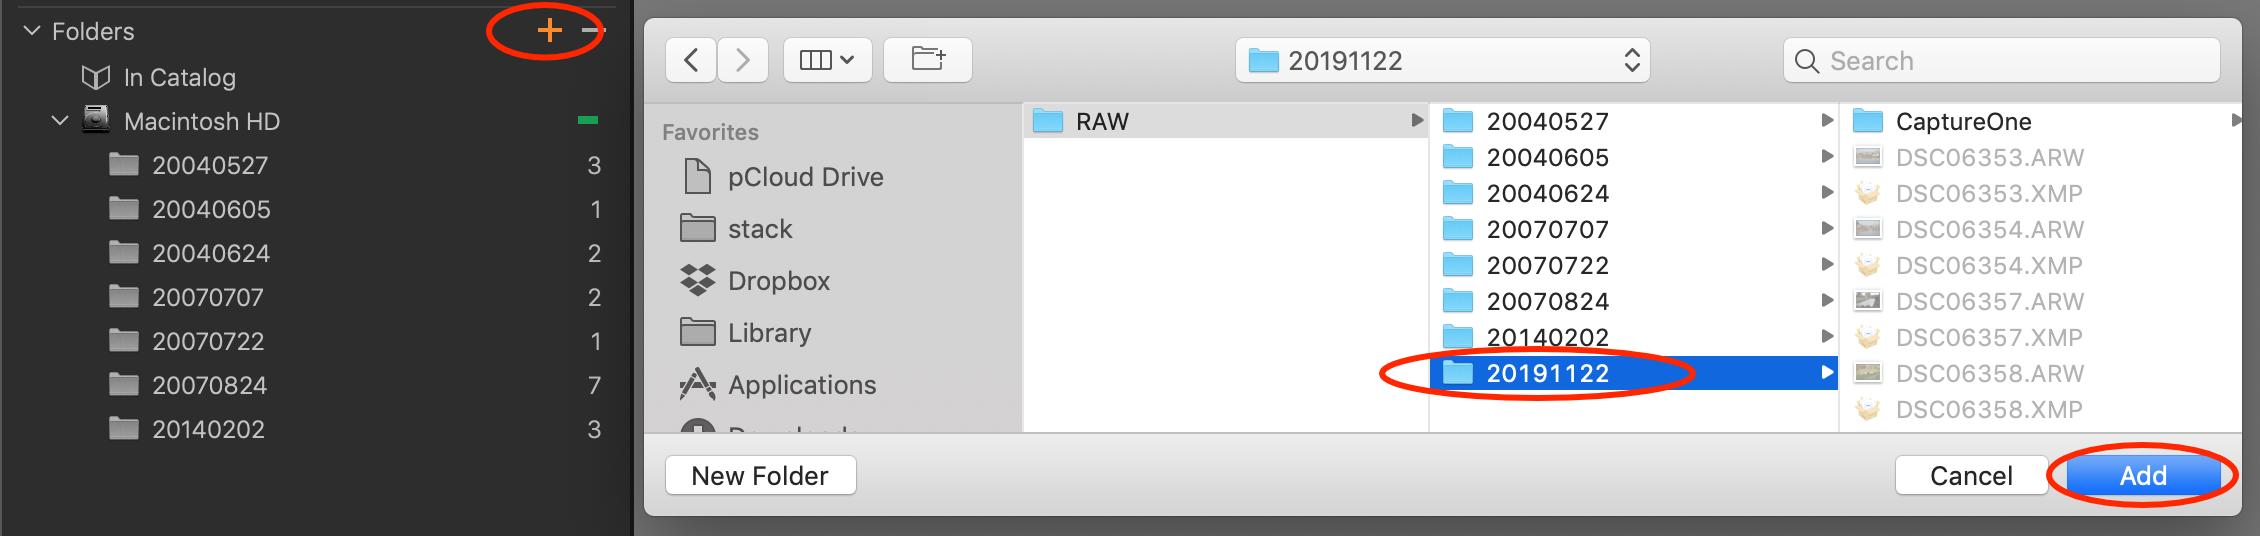 add folder to catalog, capture one 20